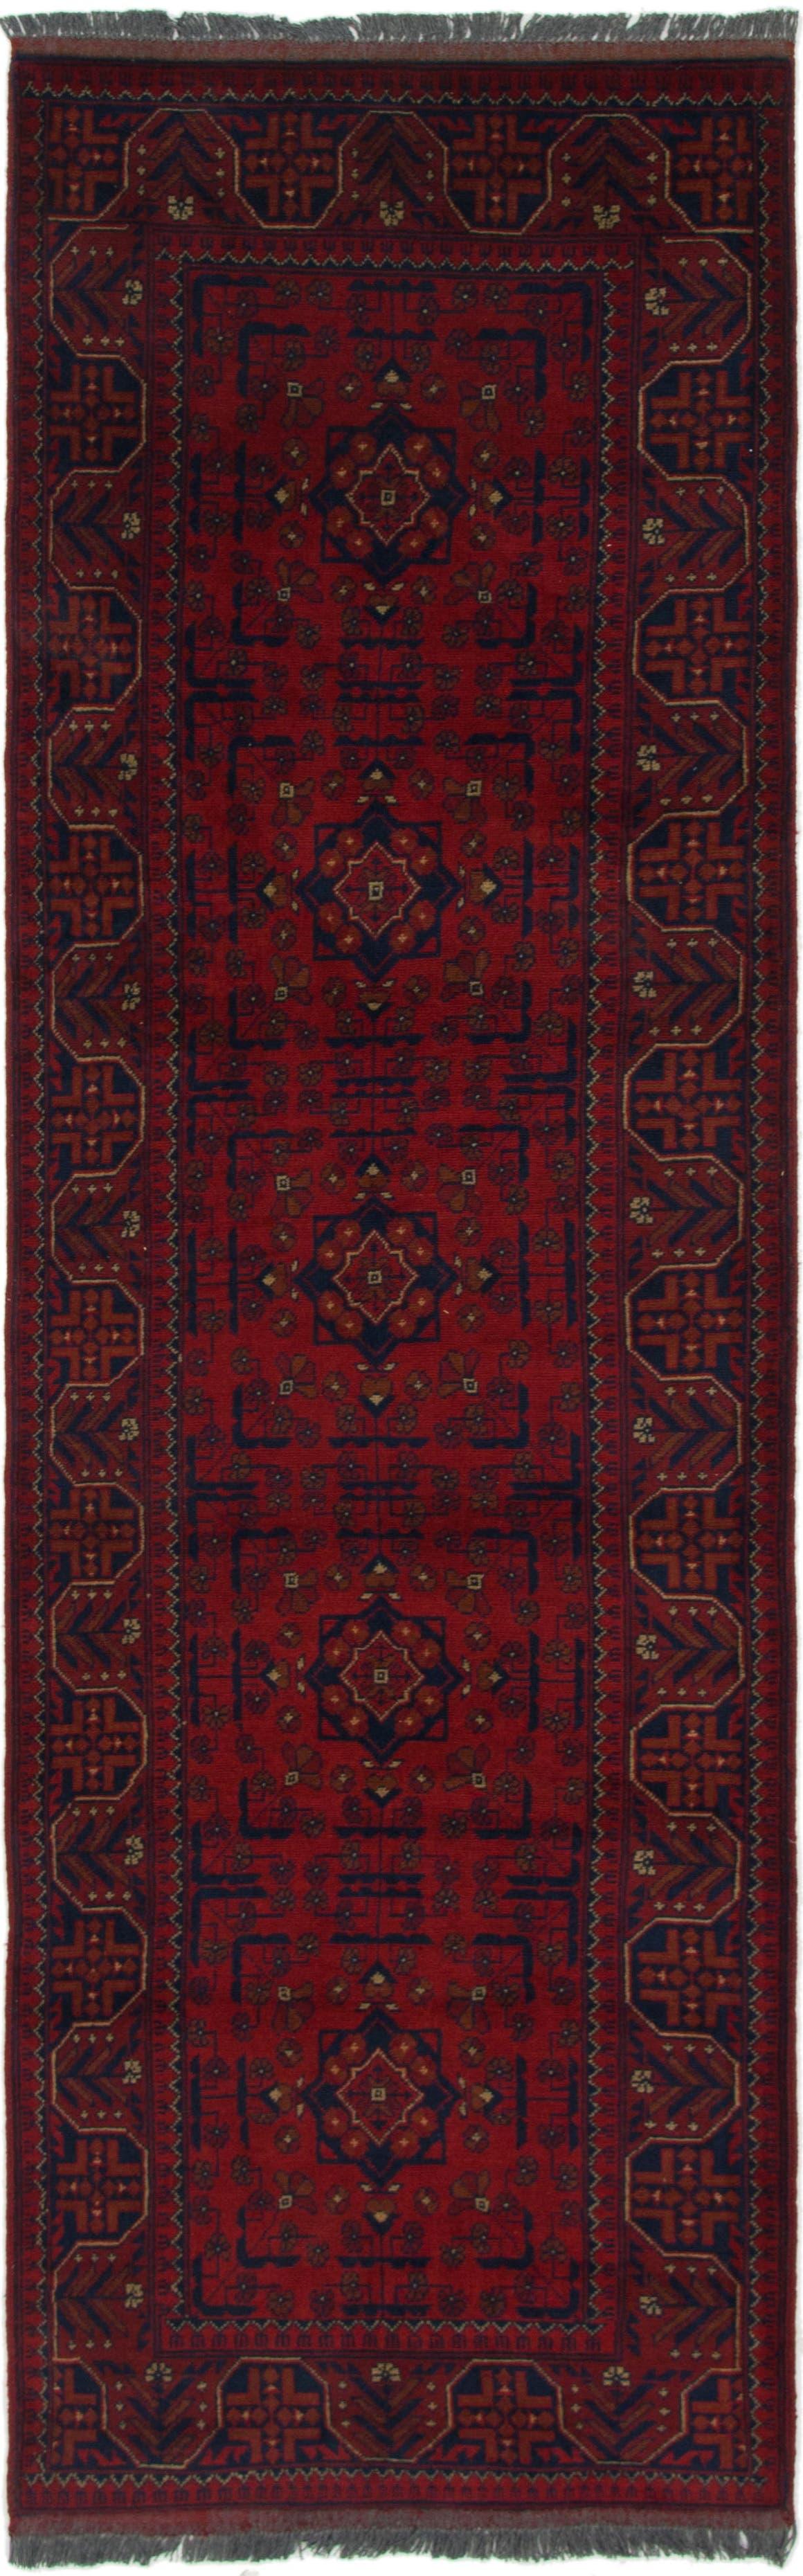 2' 9 x 9' 7 Khal Mohammadi Runner Rug main image